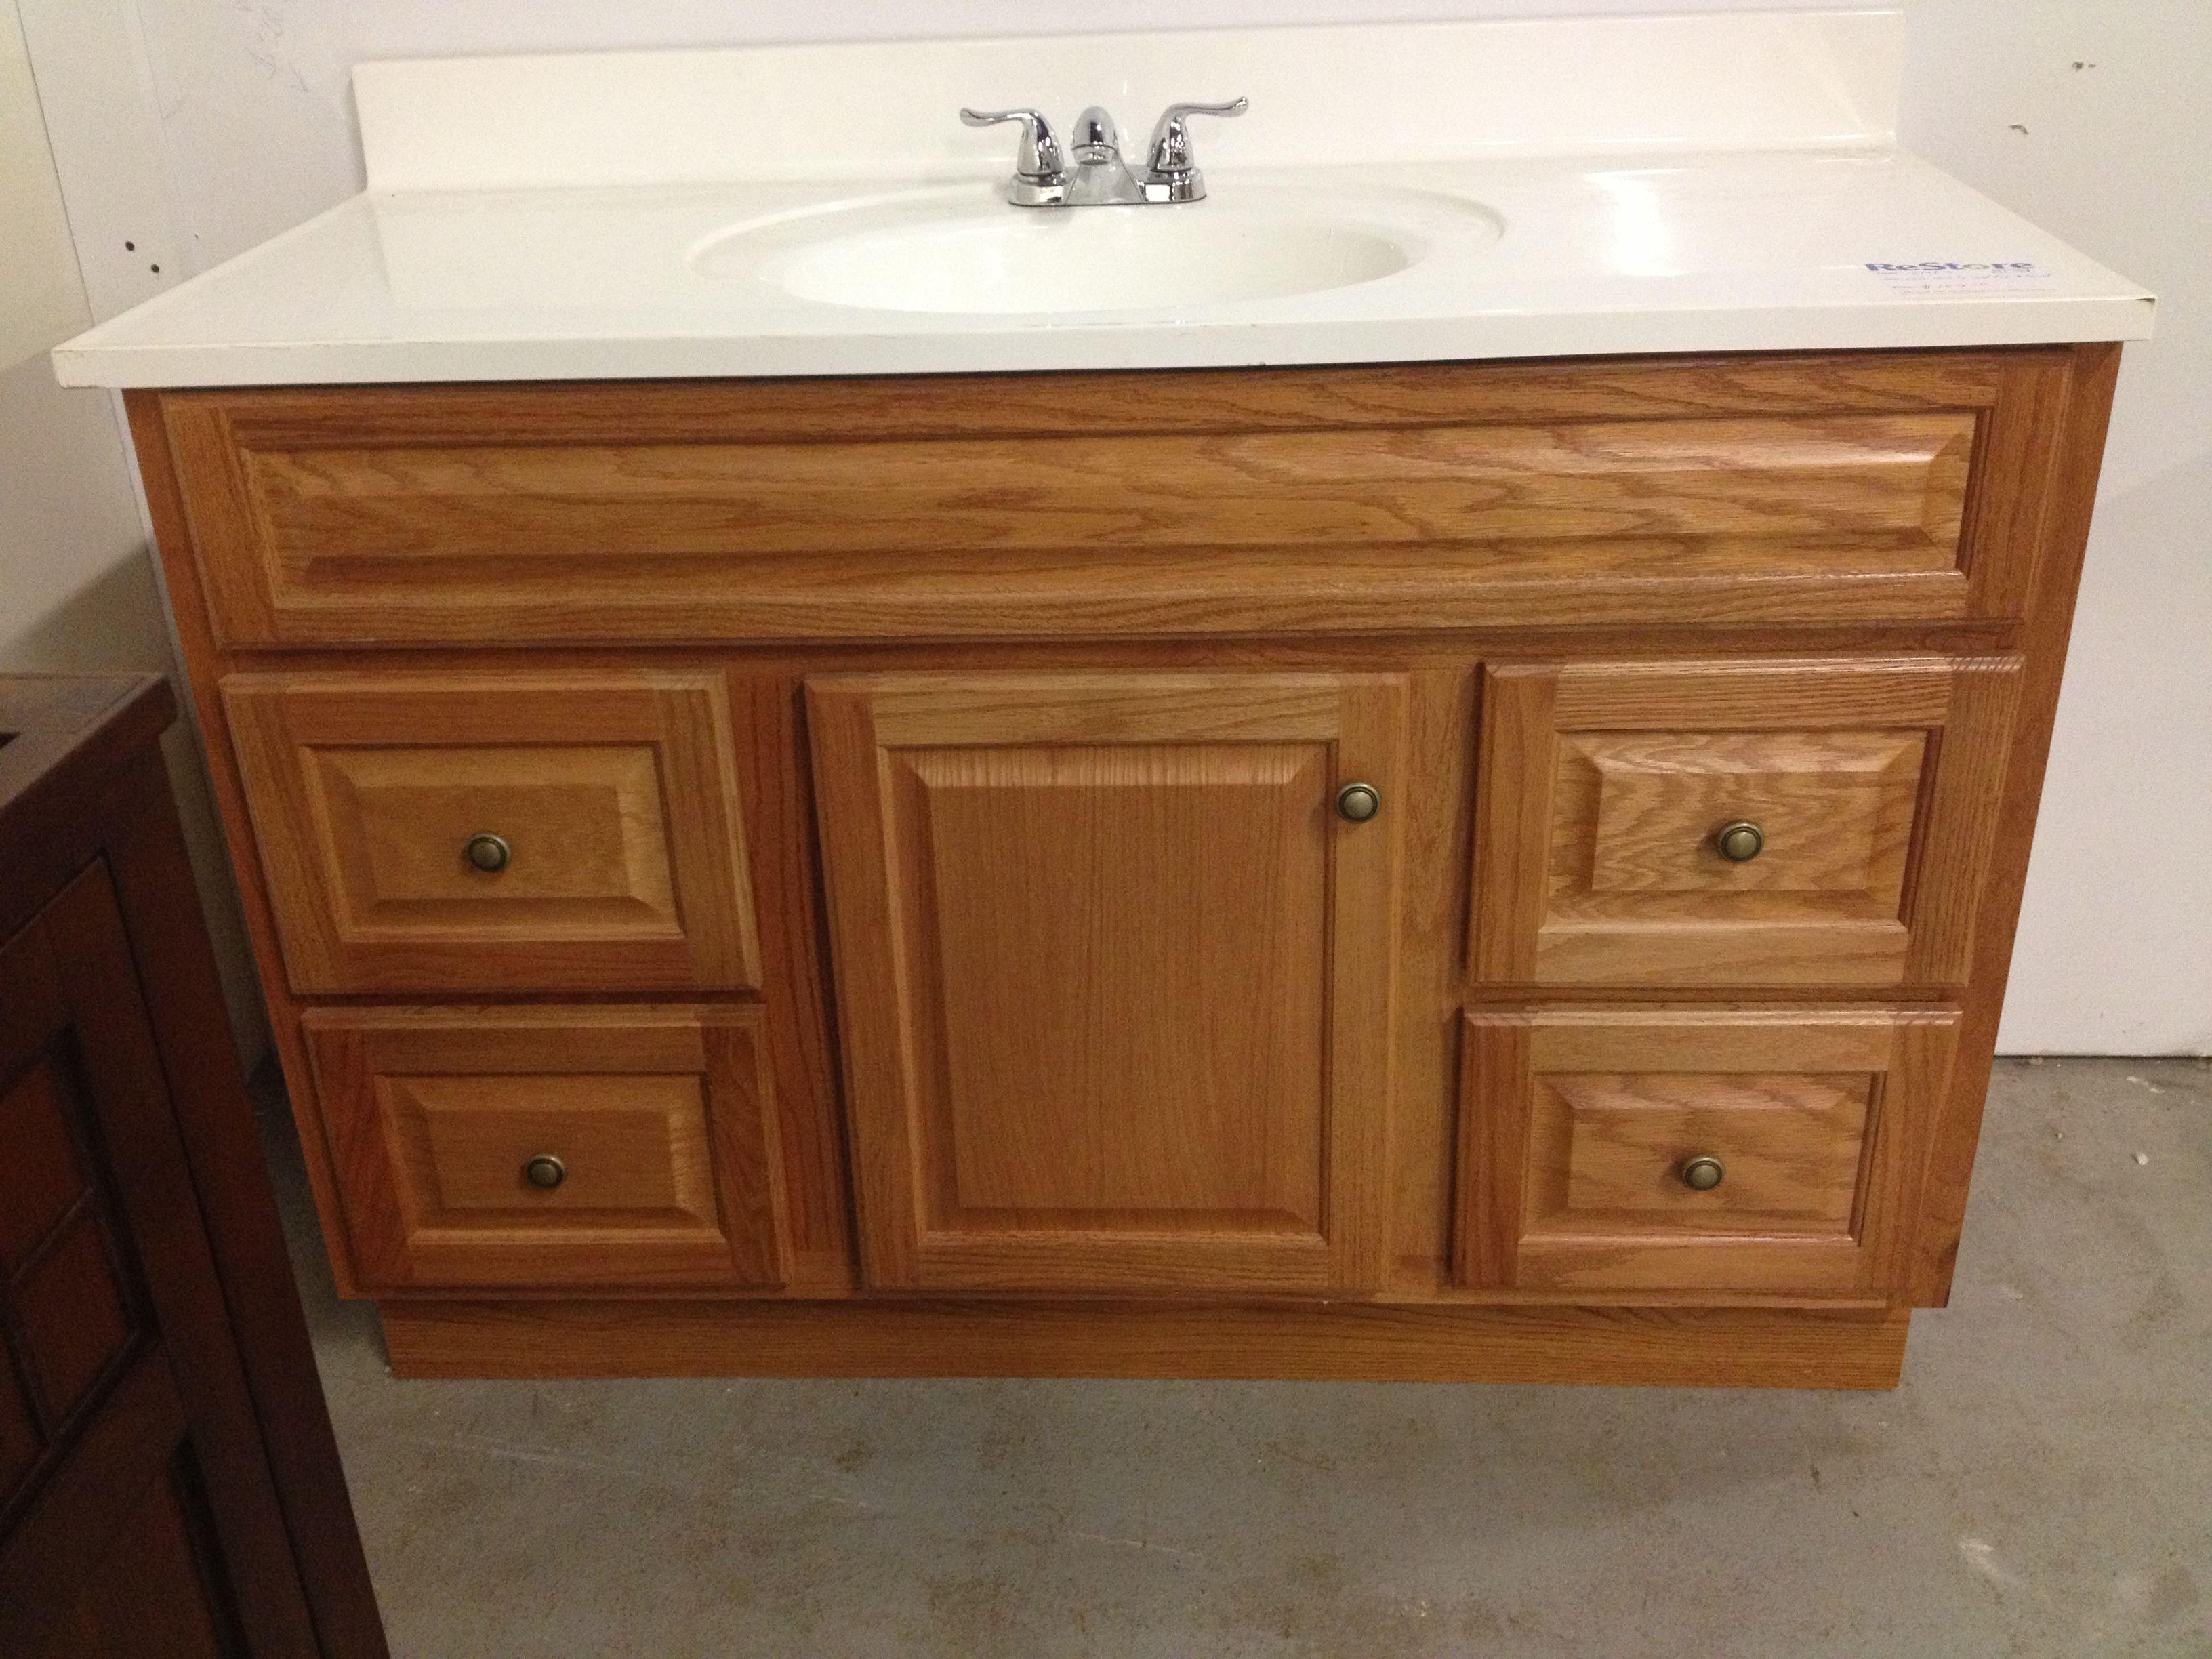 oak bathroom vanity hfhcfc habitat restore in stratford pinterest